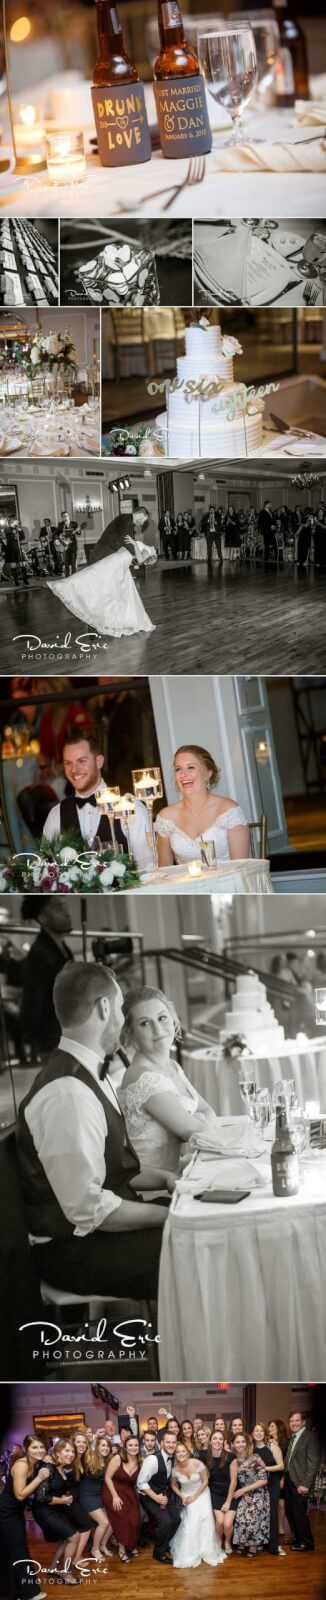 wedding photo at the westin govornor morris in reception photos